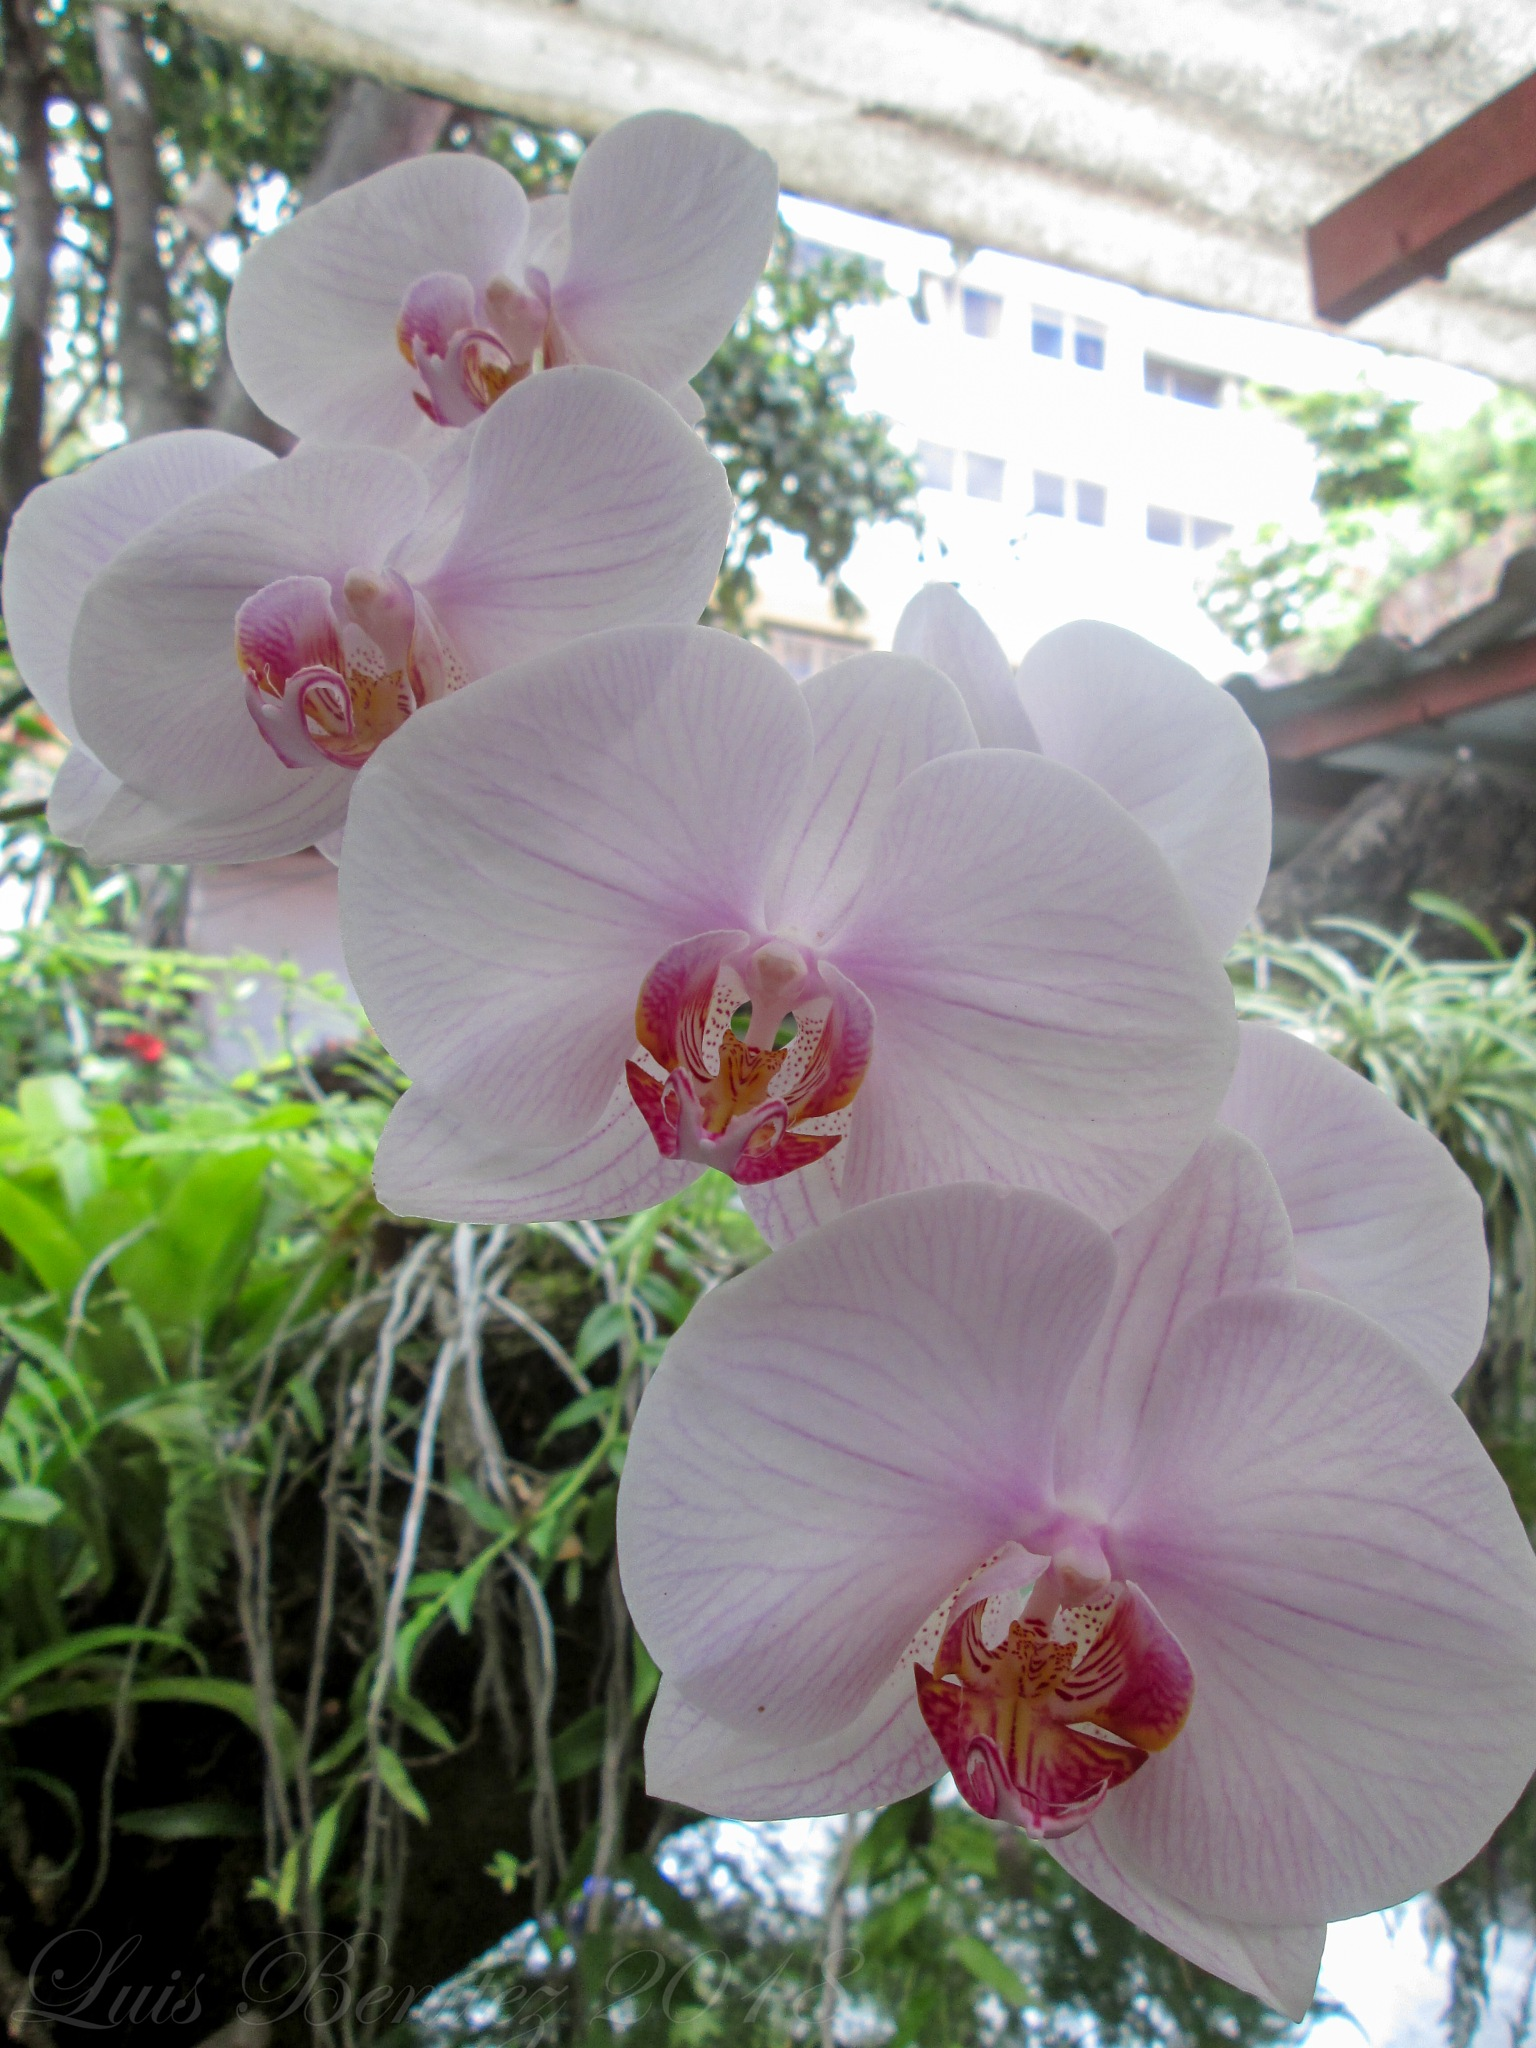 Butterfly Orchids by Luis Benítez